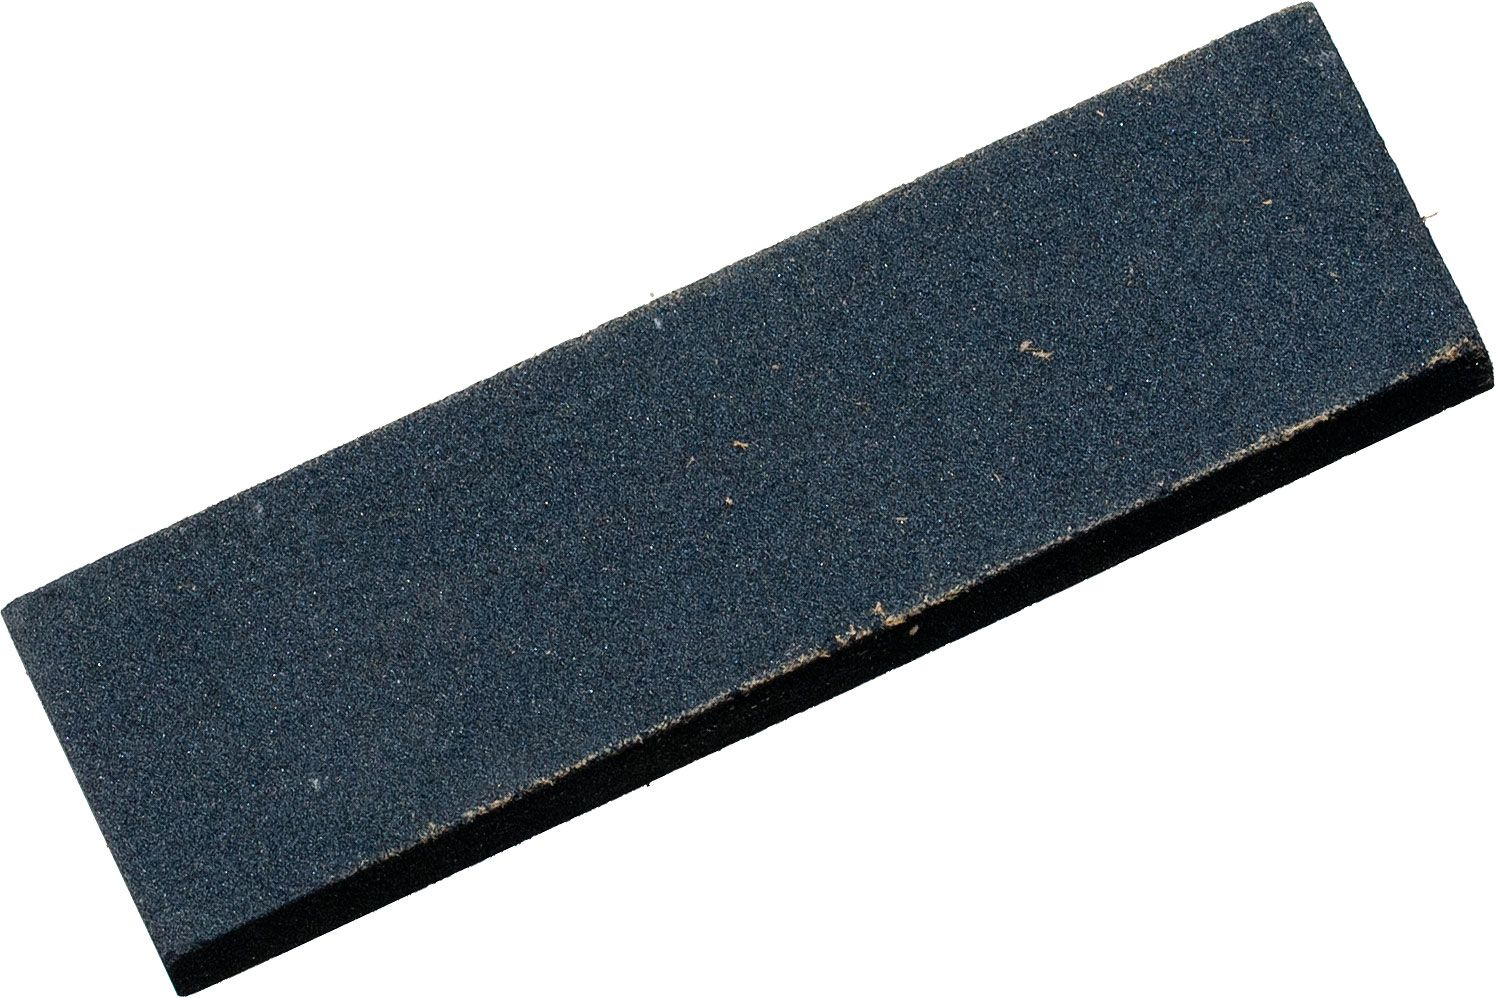 Ontario 499 Sharpening Stone 3 inch x 7/8 inch x 3/16 inch for Sheath